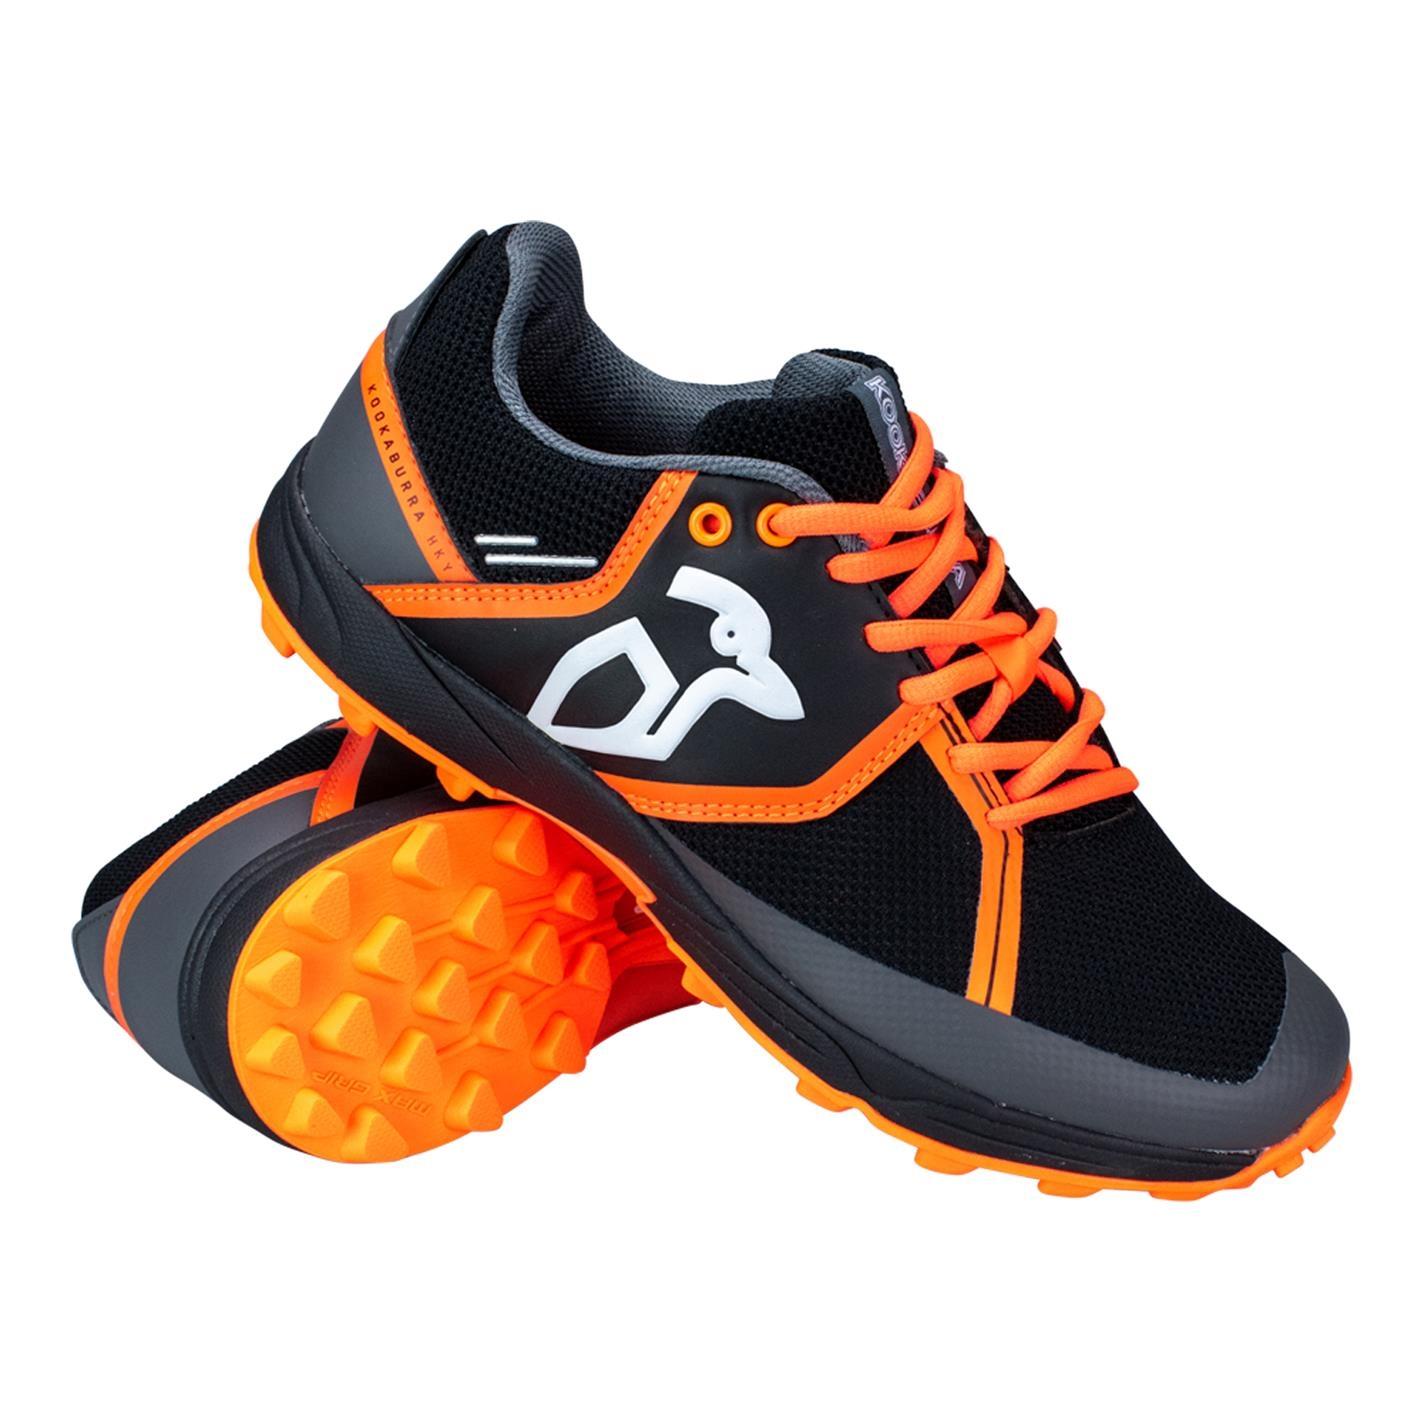 Kookaburra Convert H/Shoe Jn21 negru portocaliu